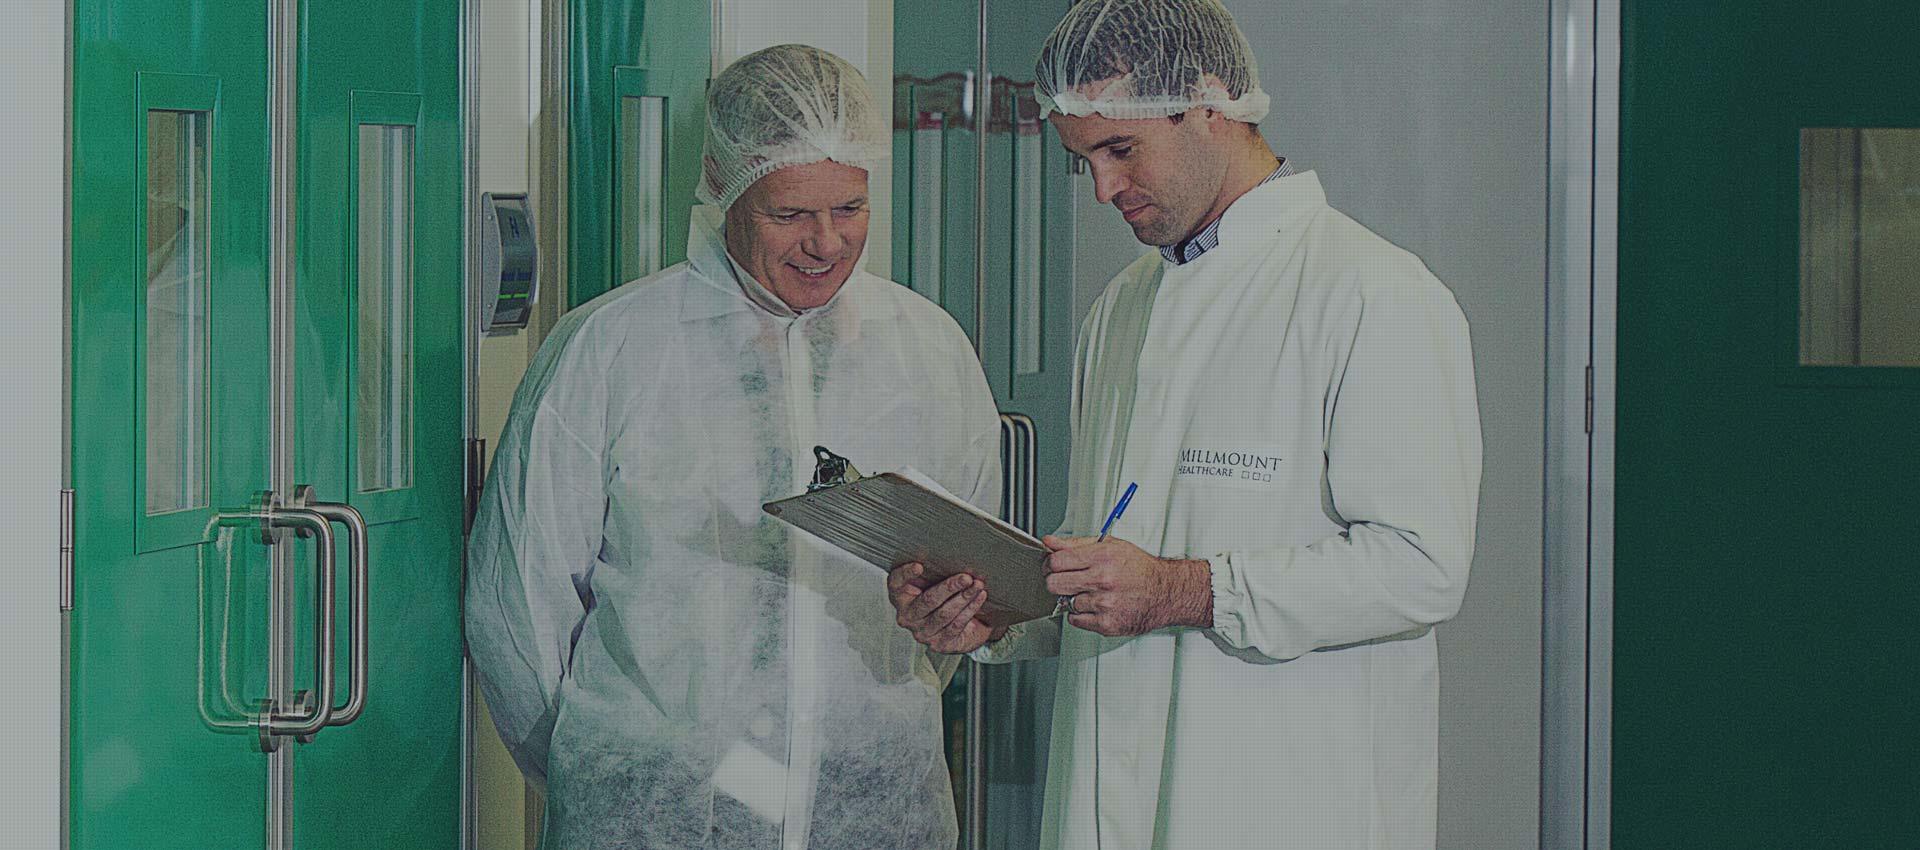 Millmount Healthcare